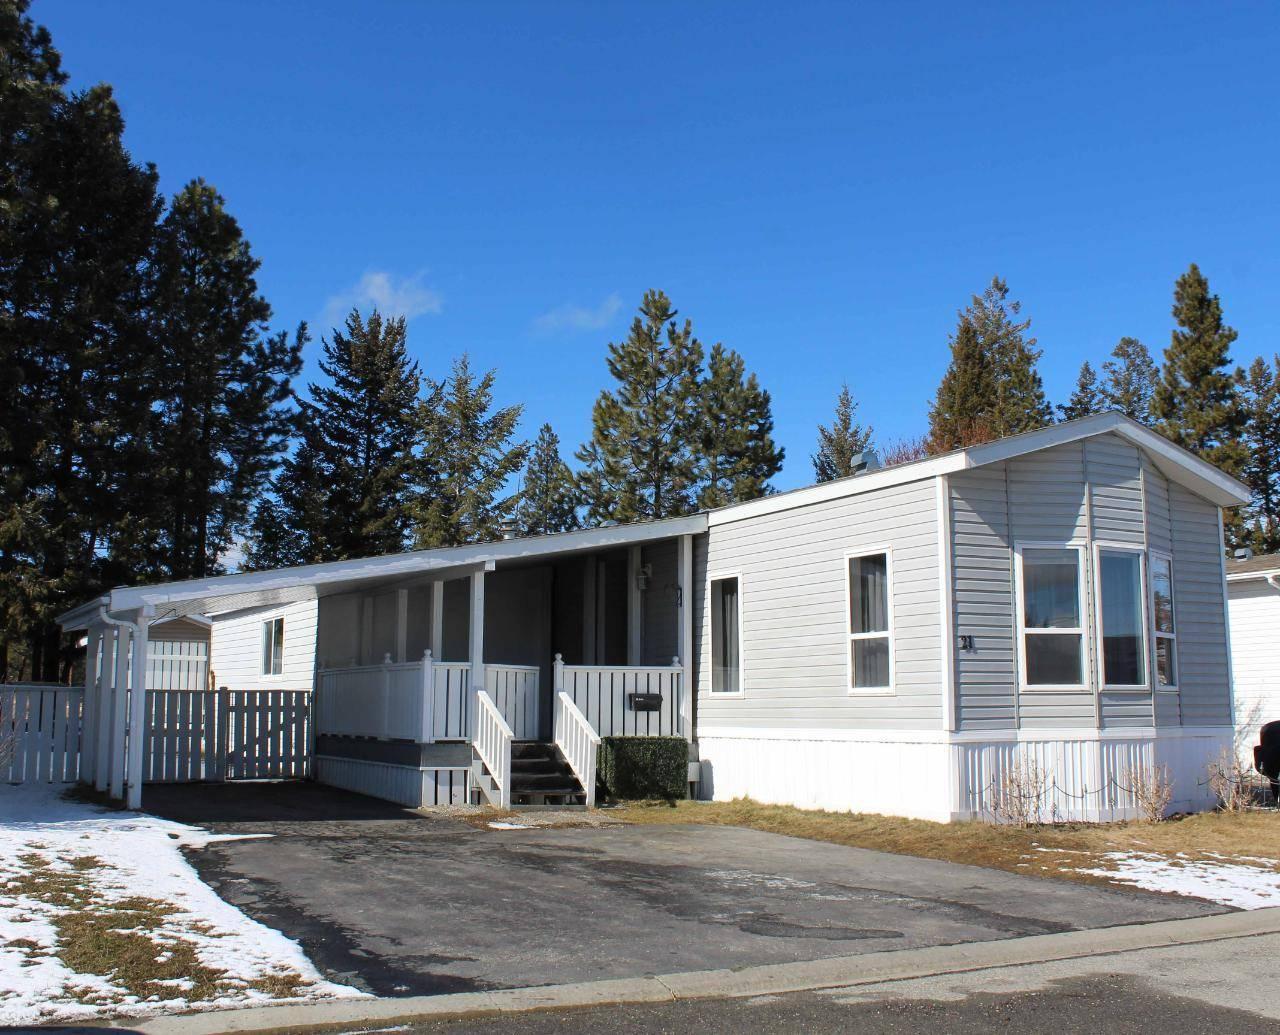 Home for sale at 2321 Industrial 2 Road N  Unit 21 Cranbrook North British Columbia - MLS: 2442432